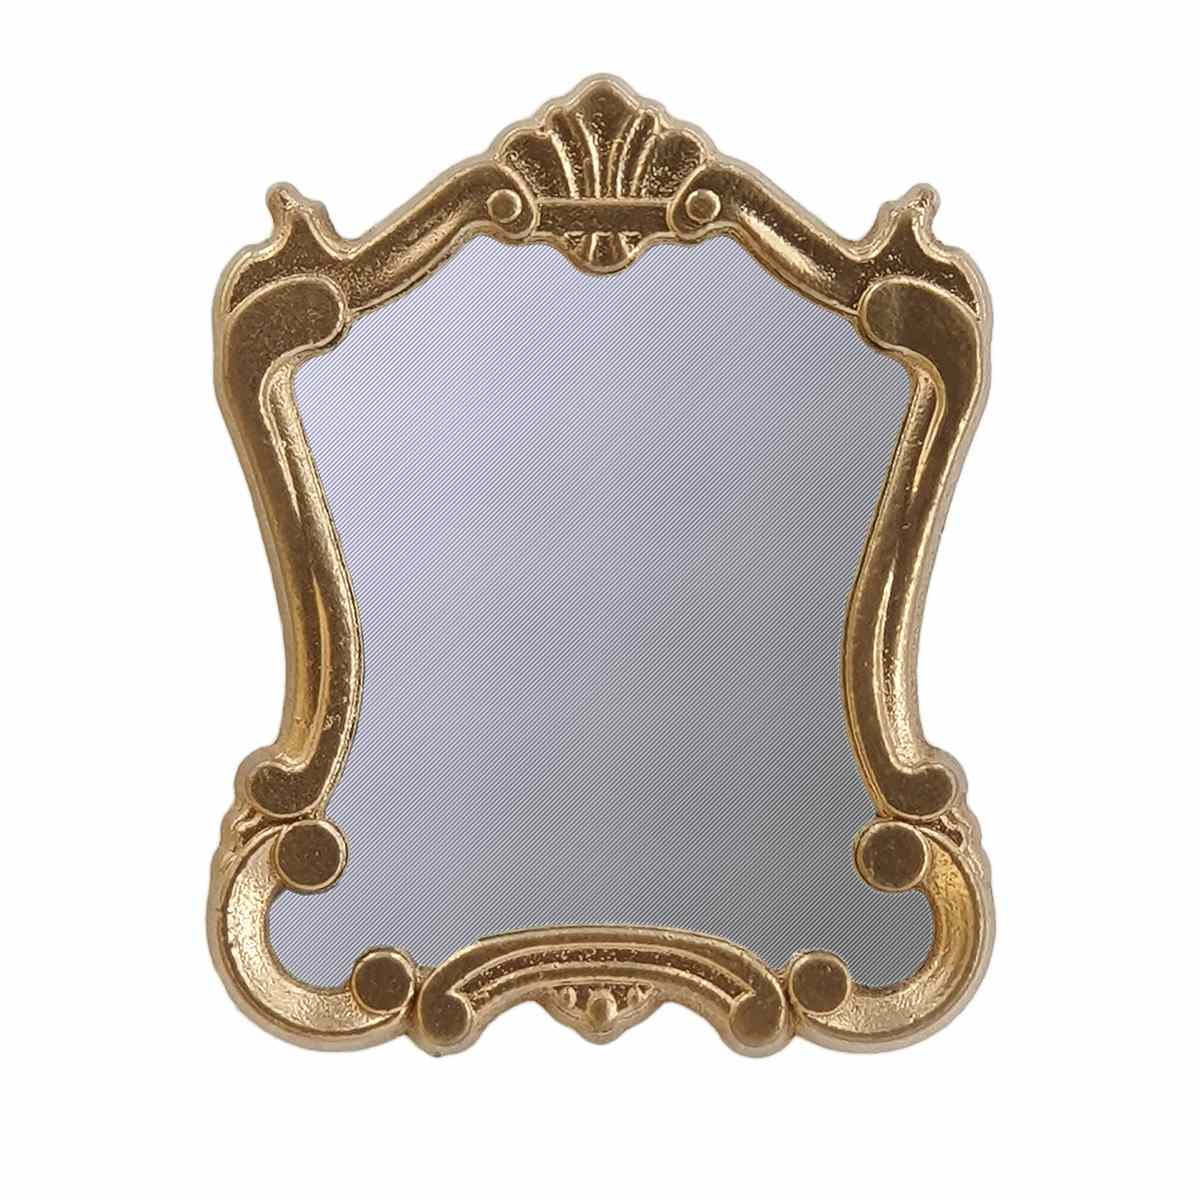 Großer antiker Spiegel, Kunststoffrahmen, goldlackiert